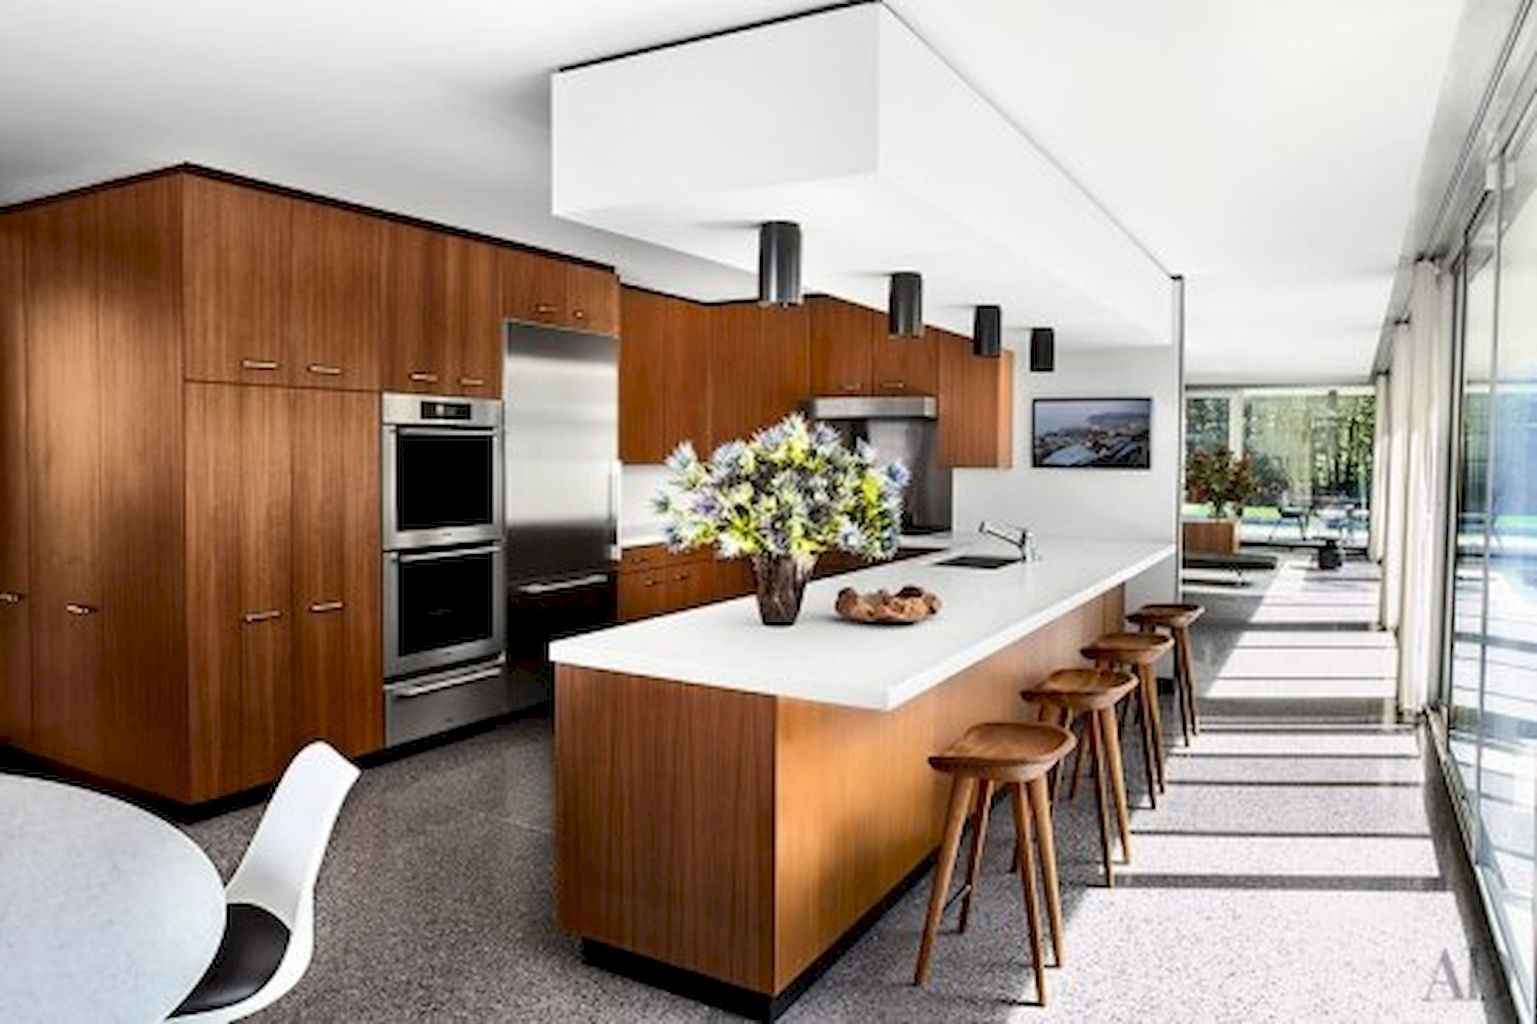 Mid century modern kitchen design ideas (15)